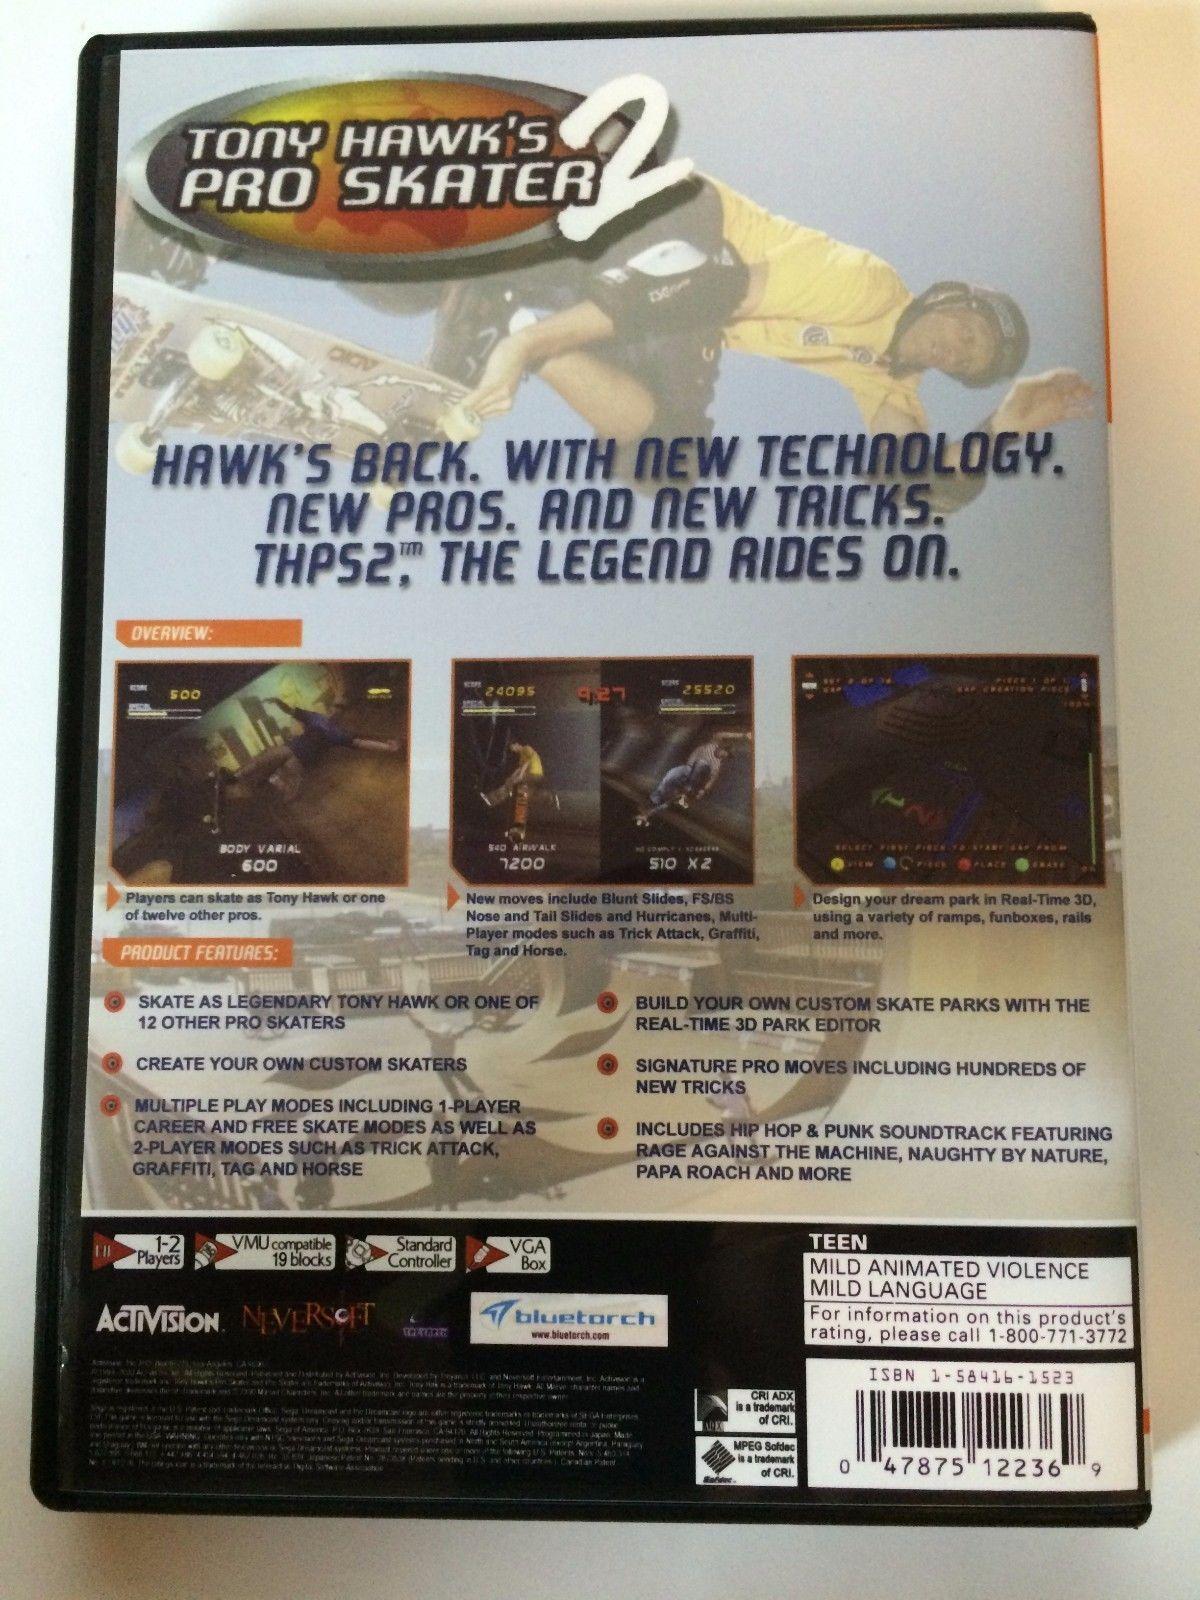 Tony Hawk's Pro Skater 2 - Sega Dreamcast - Replacement Case - No Game